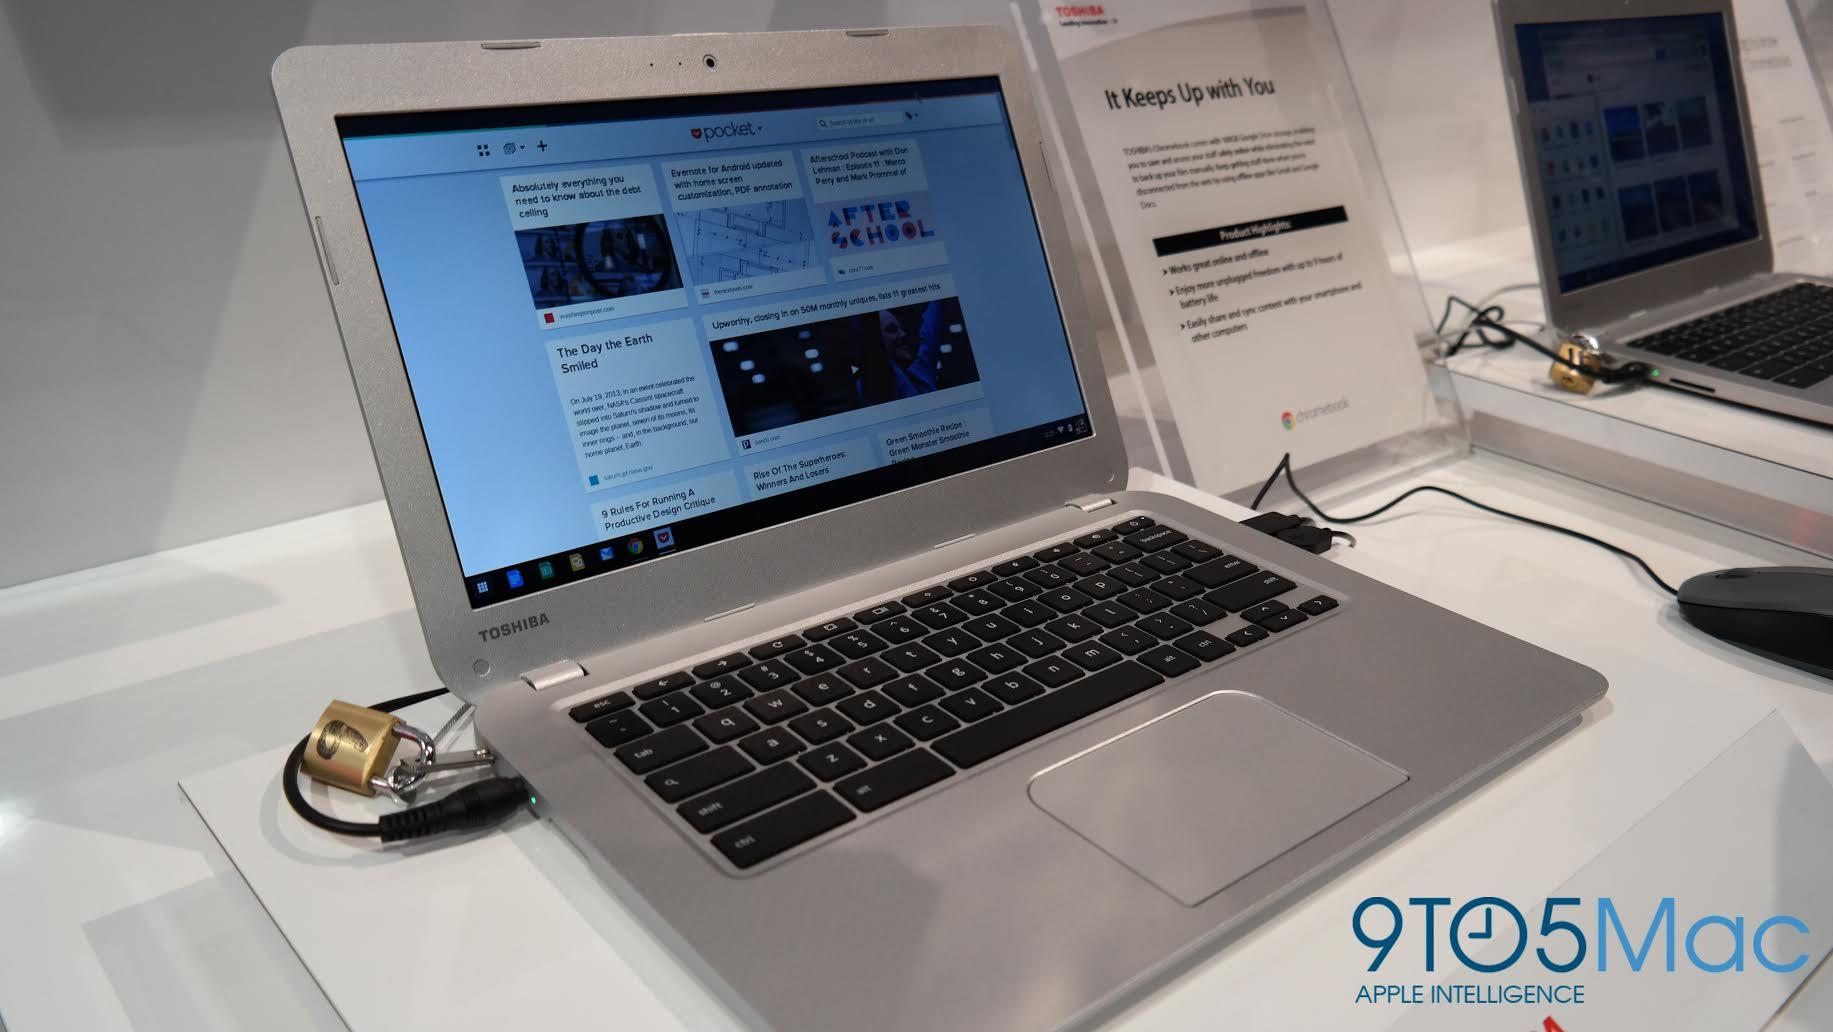 Toshiba MacBook Pro